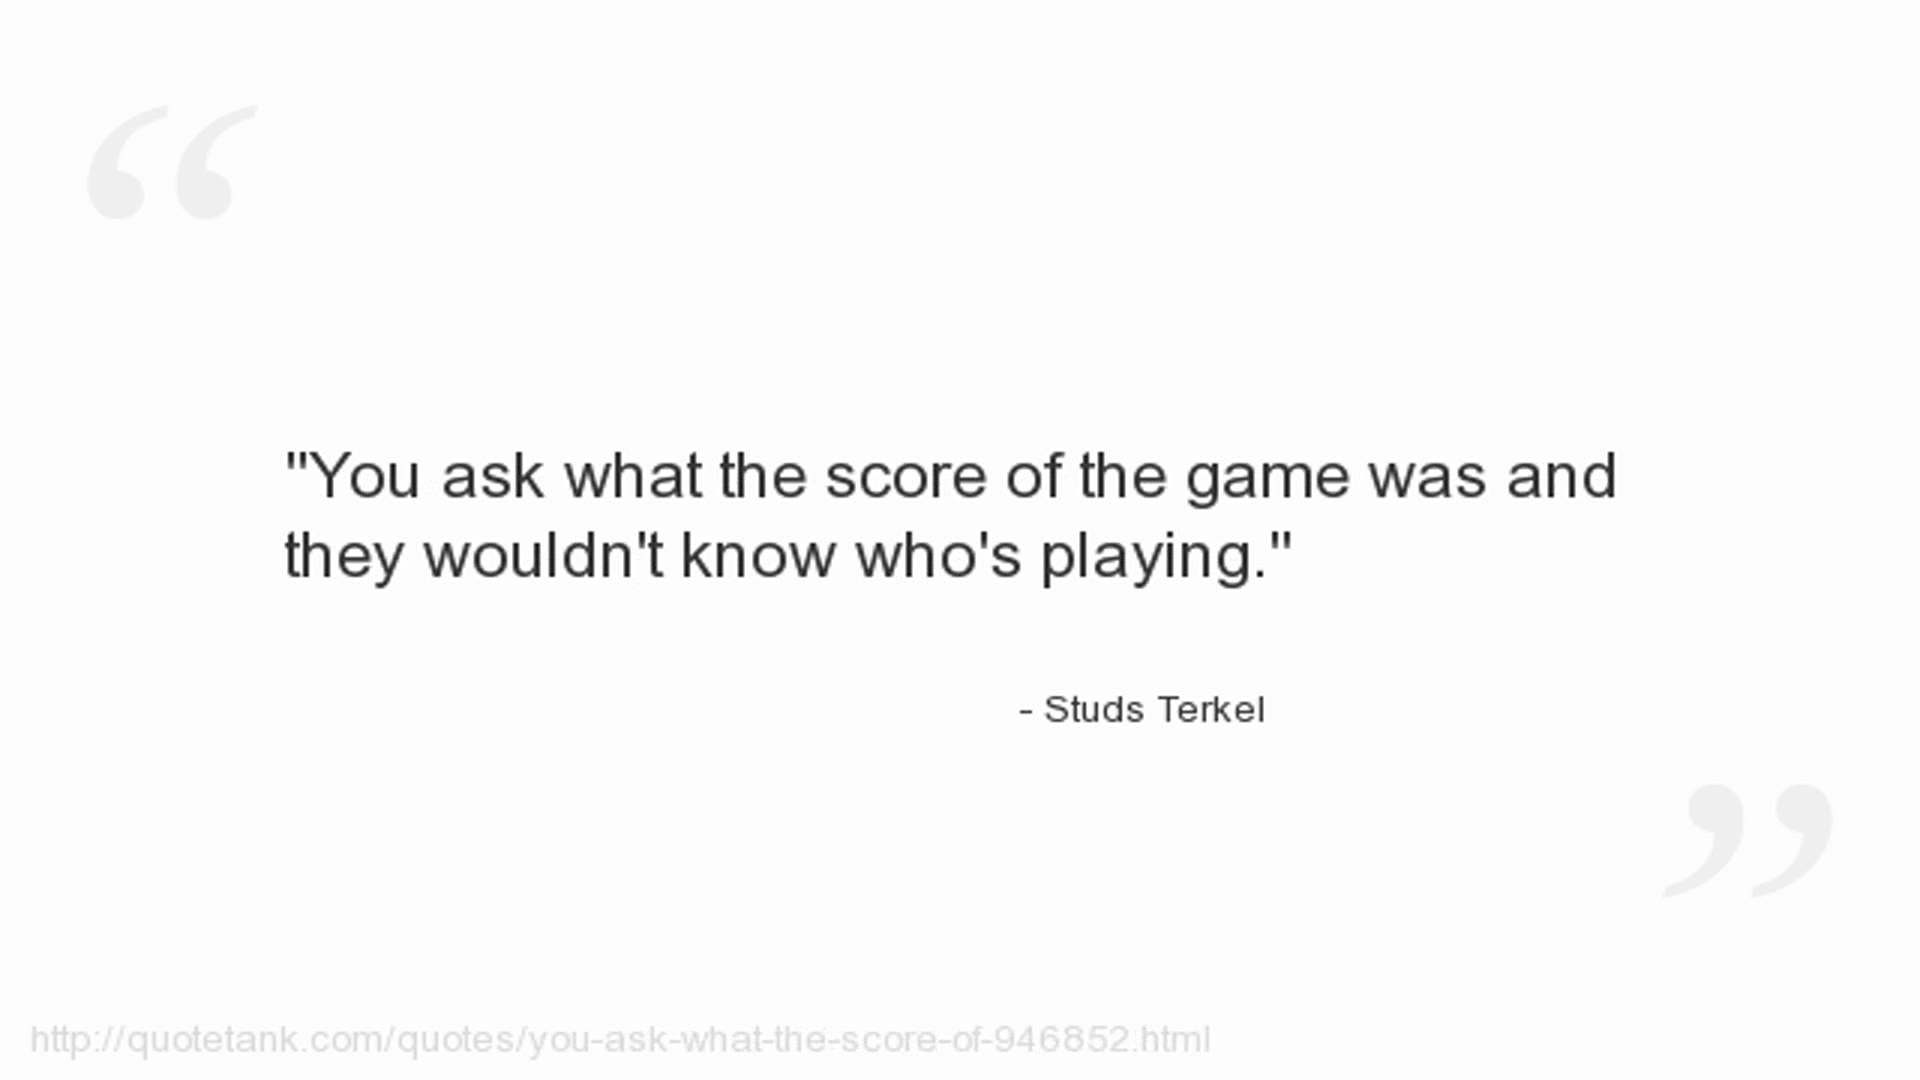 Studs Terkel's quote #2